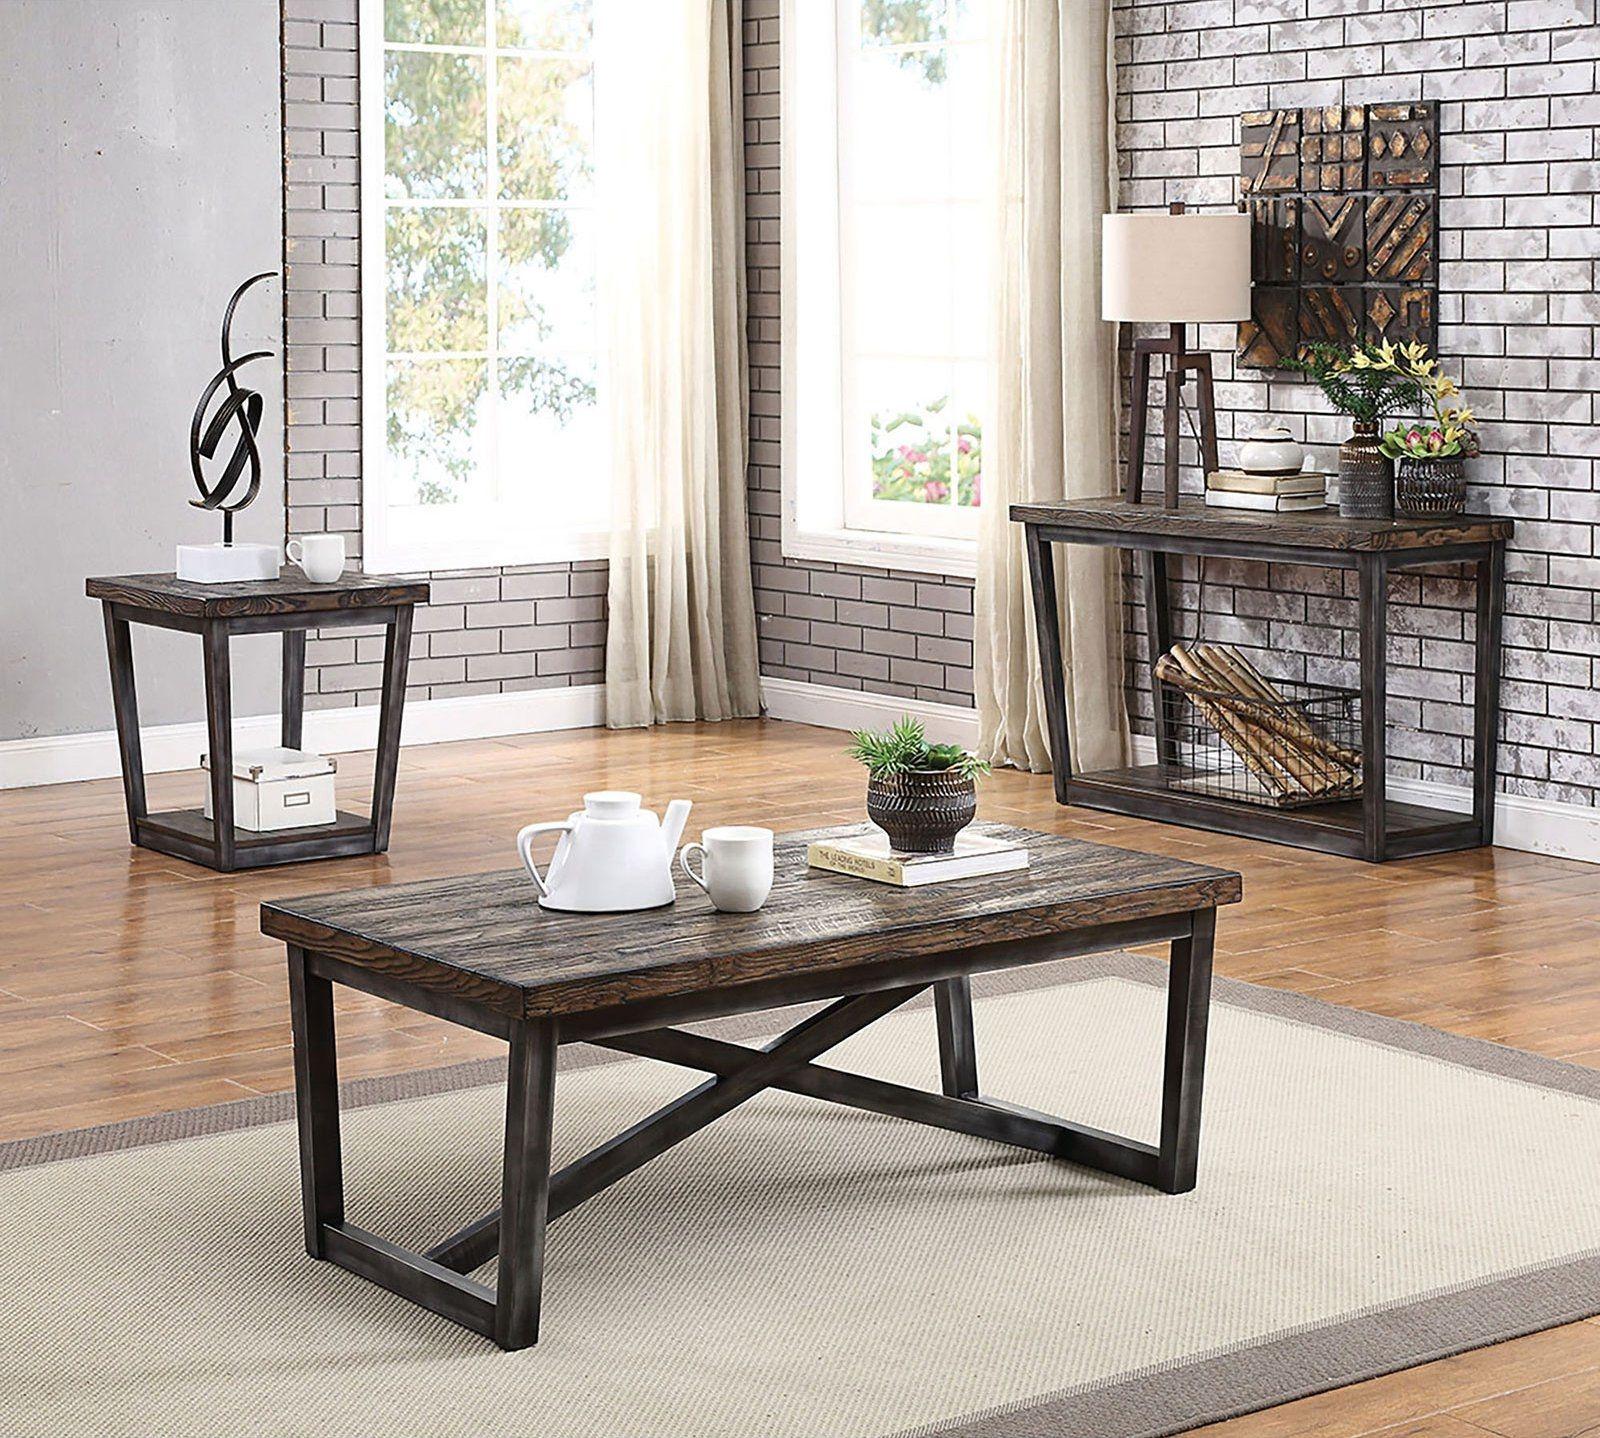 Sixten Coffee Table Cm4378c Furniture Of America Coffee Tables Coffee Table 3 Piece Coffee Table Set Industrial Design Style [ 1438 x 1600 Pixel ]